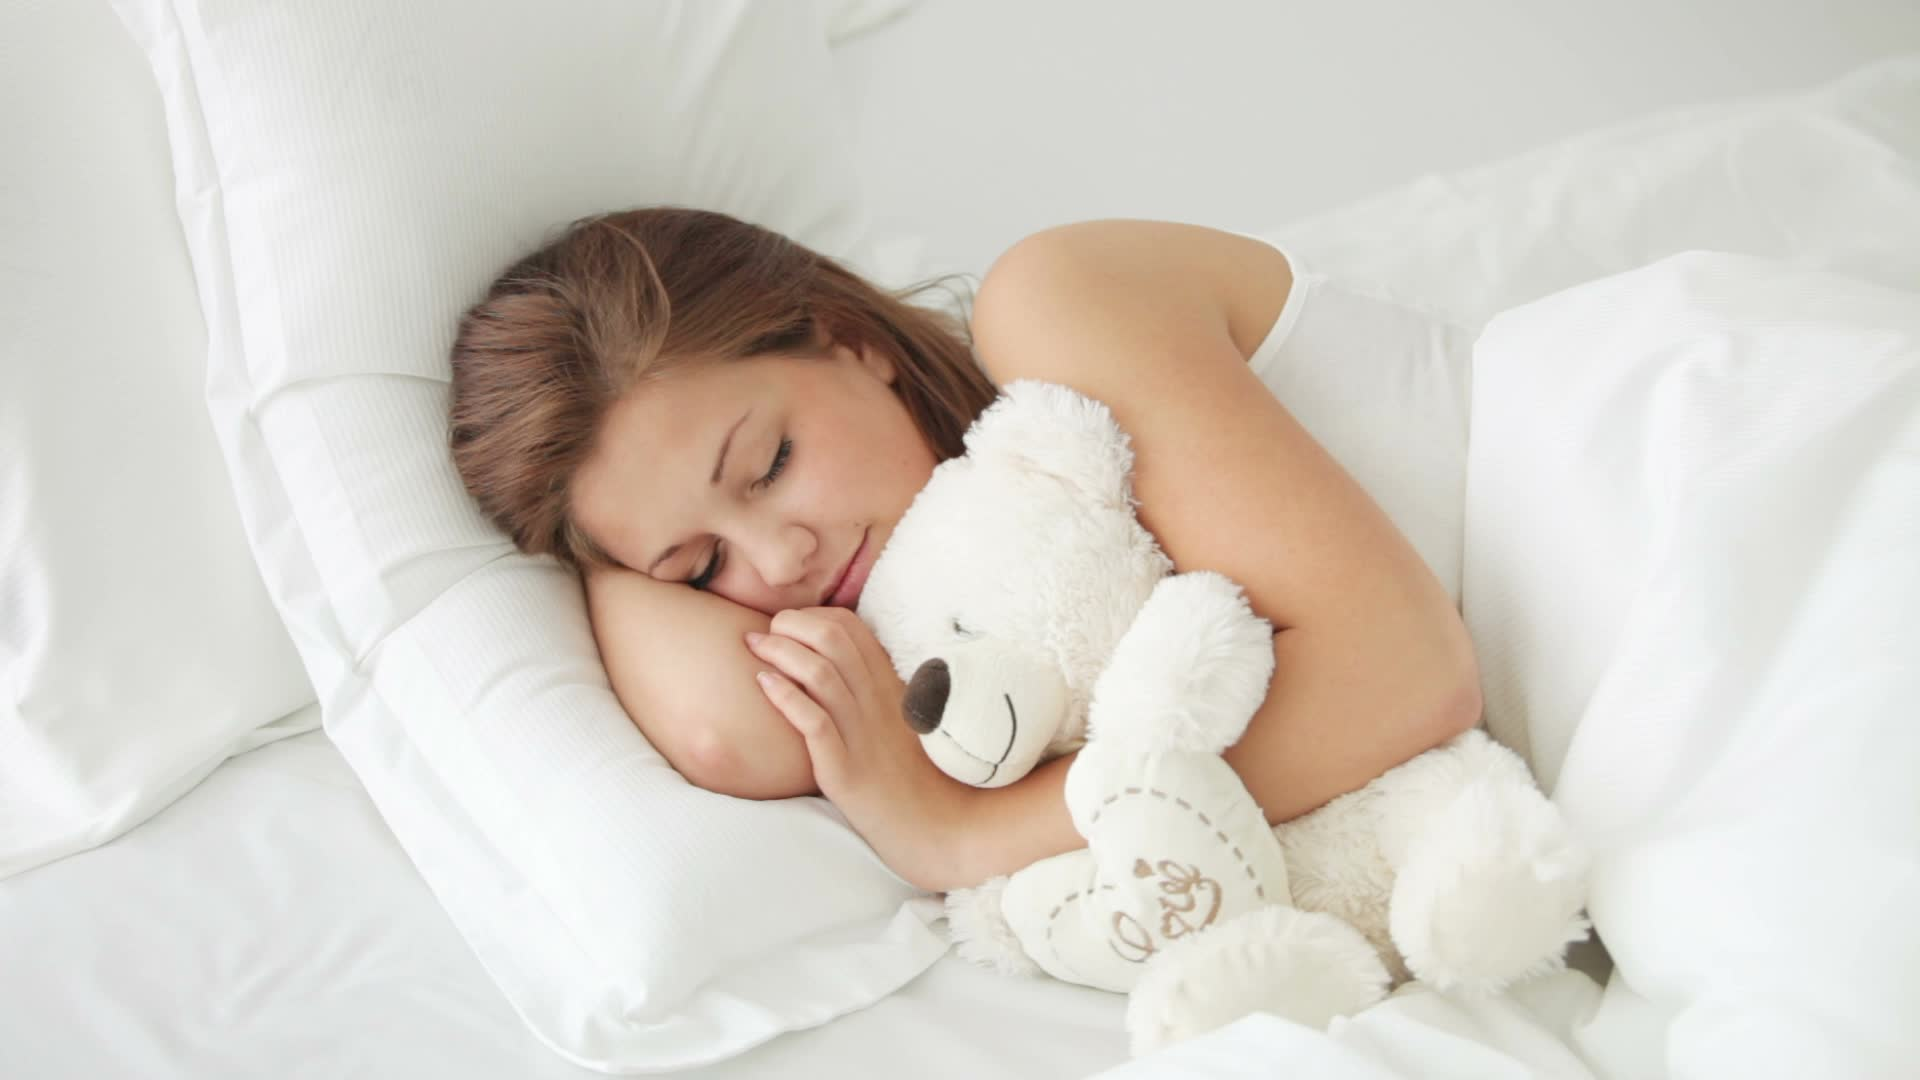 К чему сниться ложиться спать во сне